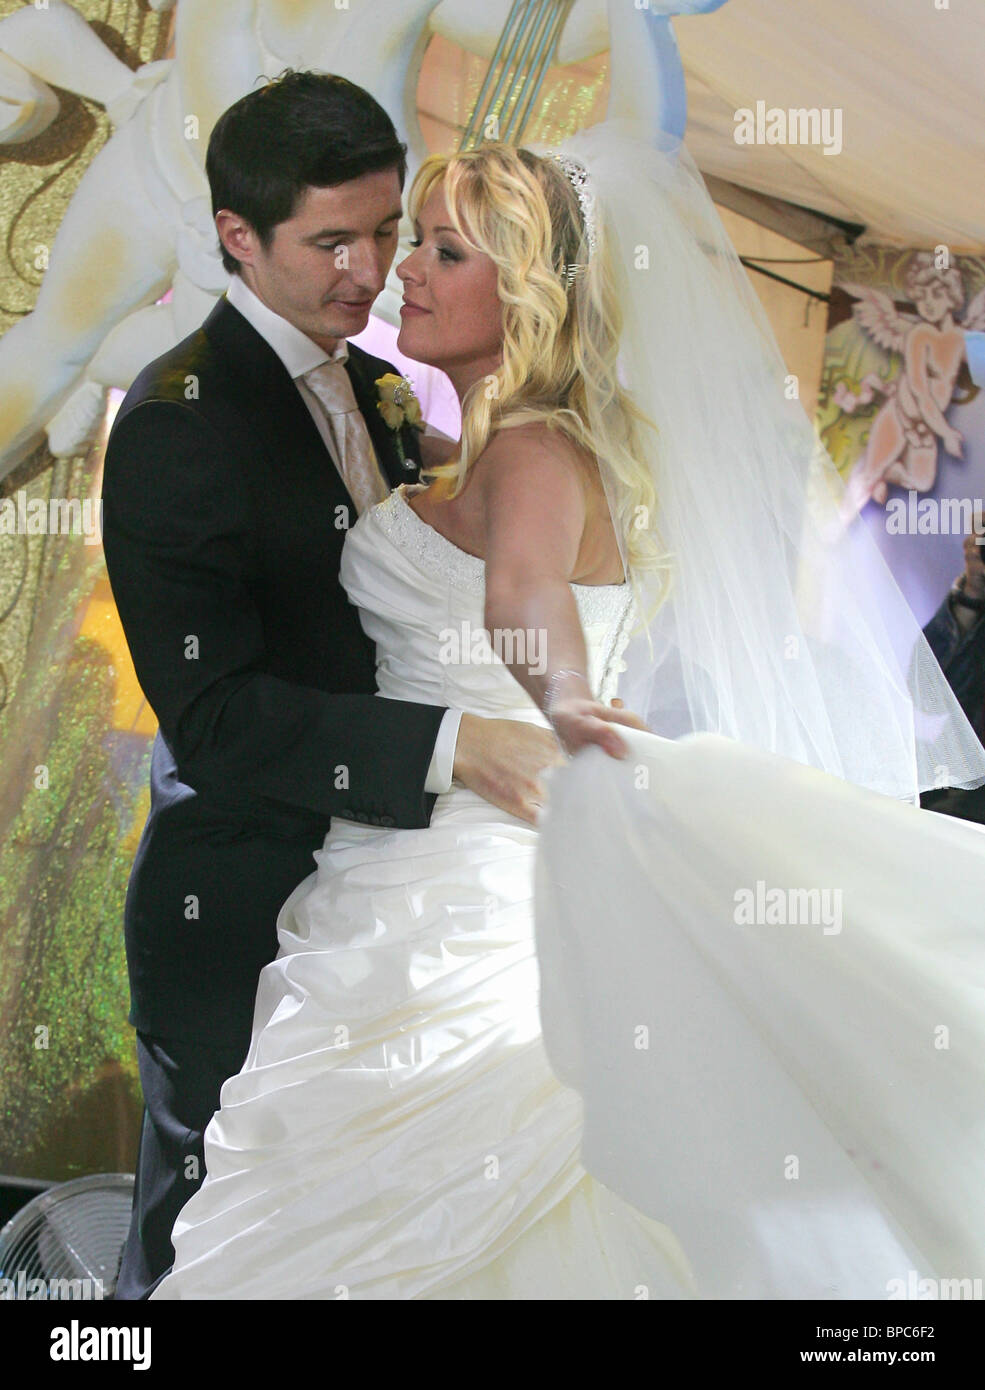 Wedding of CSKA football player Evgeni Aldonin and pop singer Yulia Nachalova - Stock Image